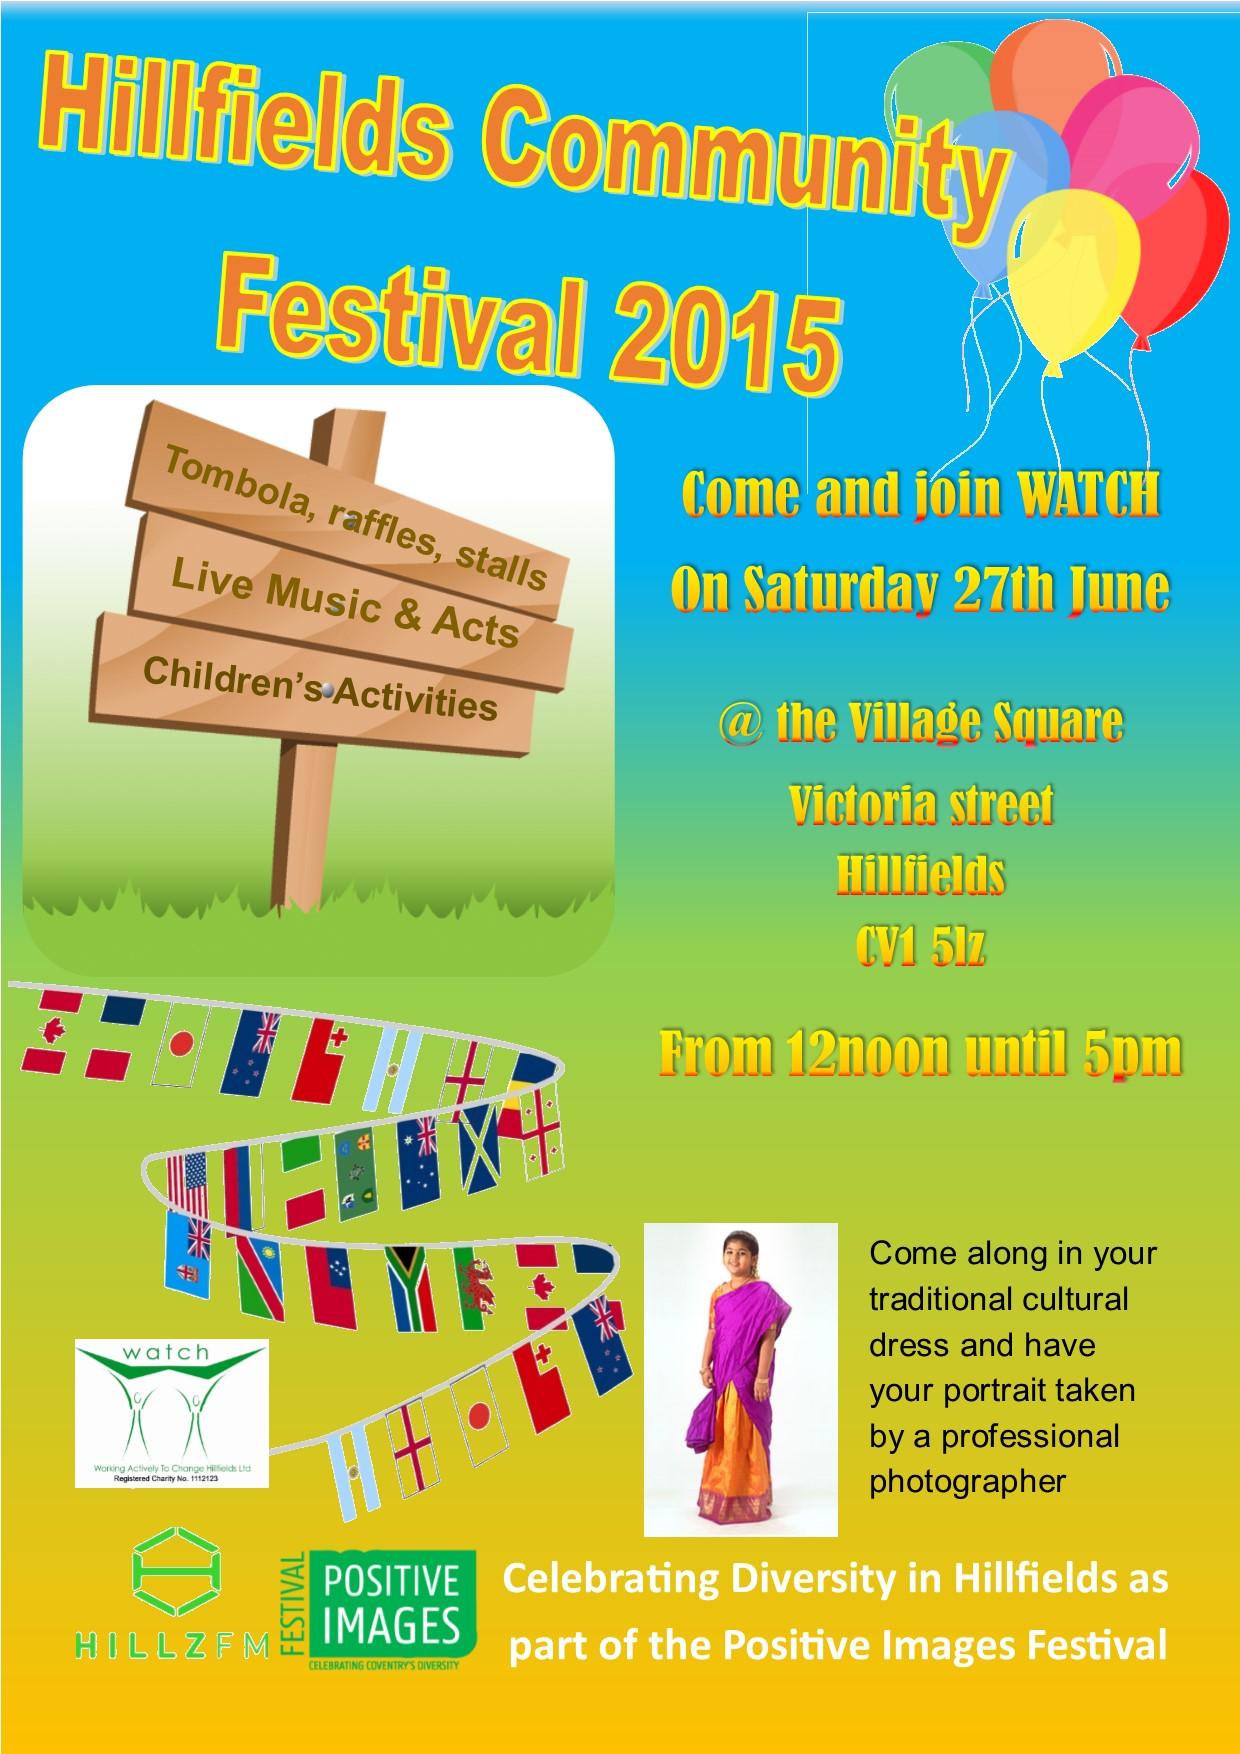 Hillfields Community Festival 2015